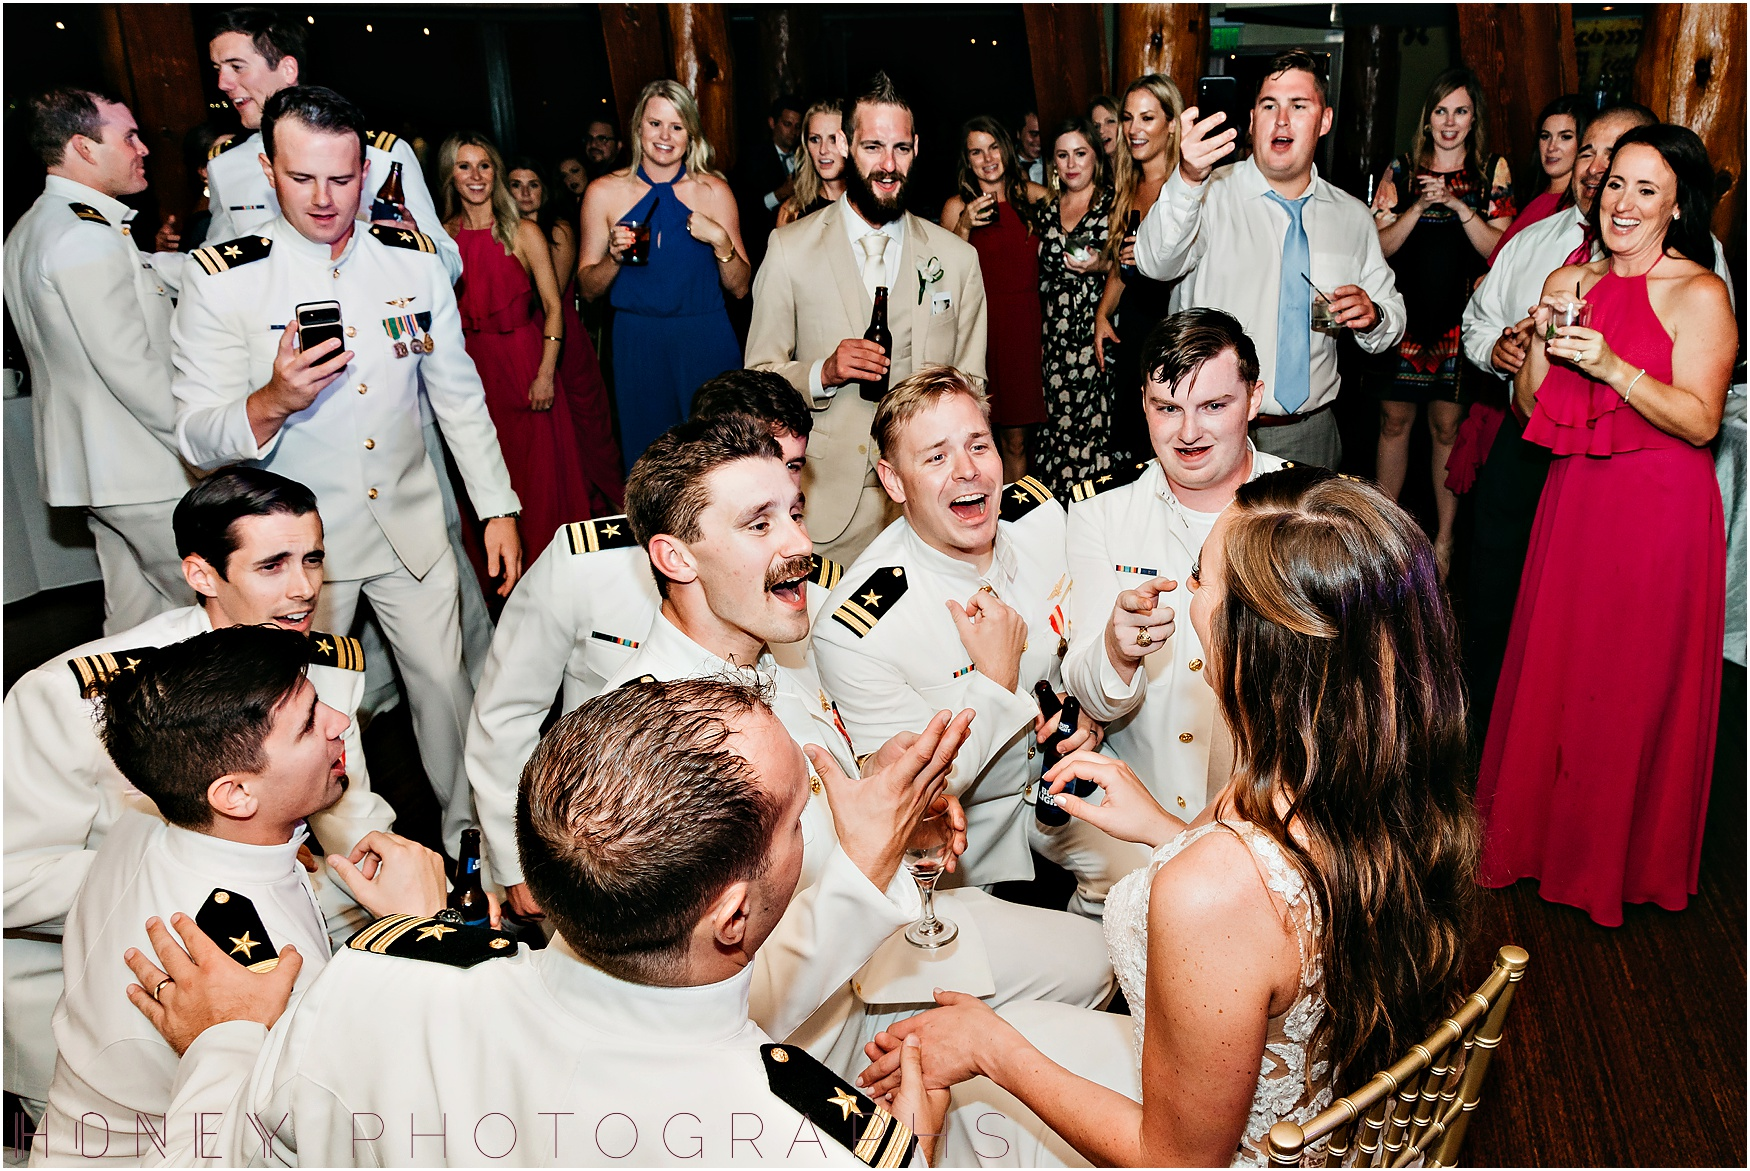 bali-hai-tropical-bubble-exit-party-paradise-wedding066.jpg